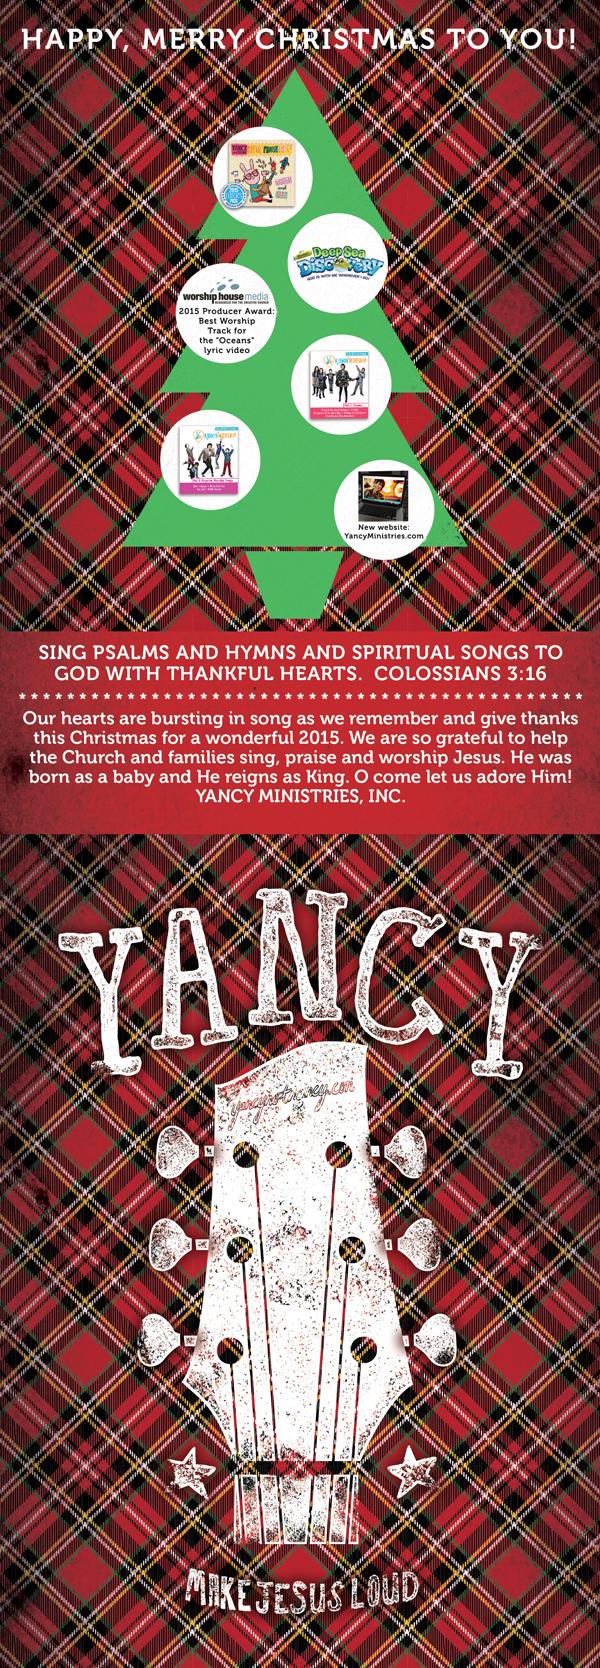 Loud House Christmas Song Lyrics : house, christmas, lyrics, Index, /yancy